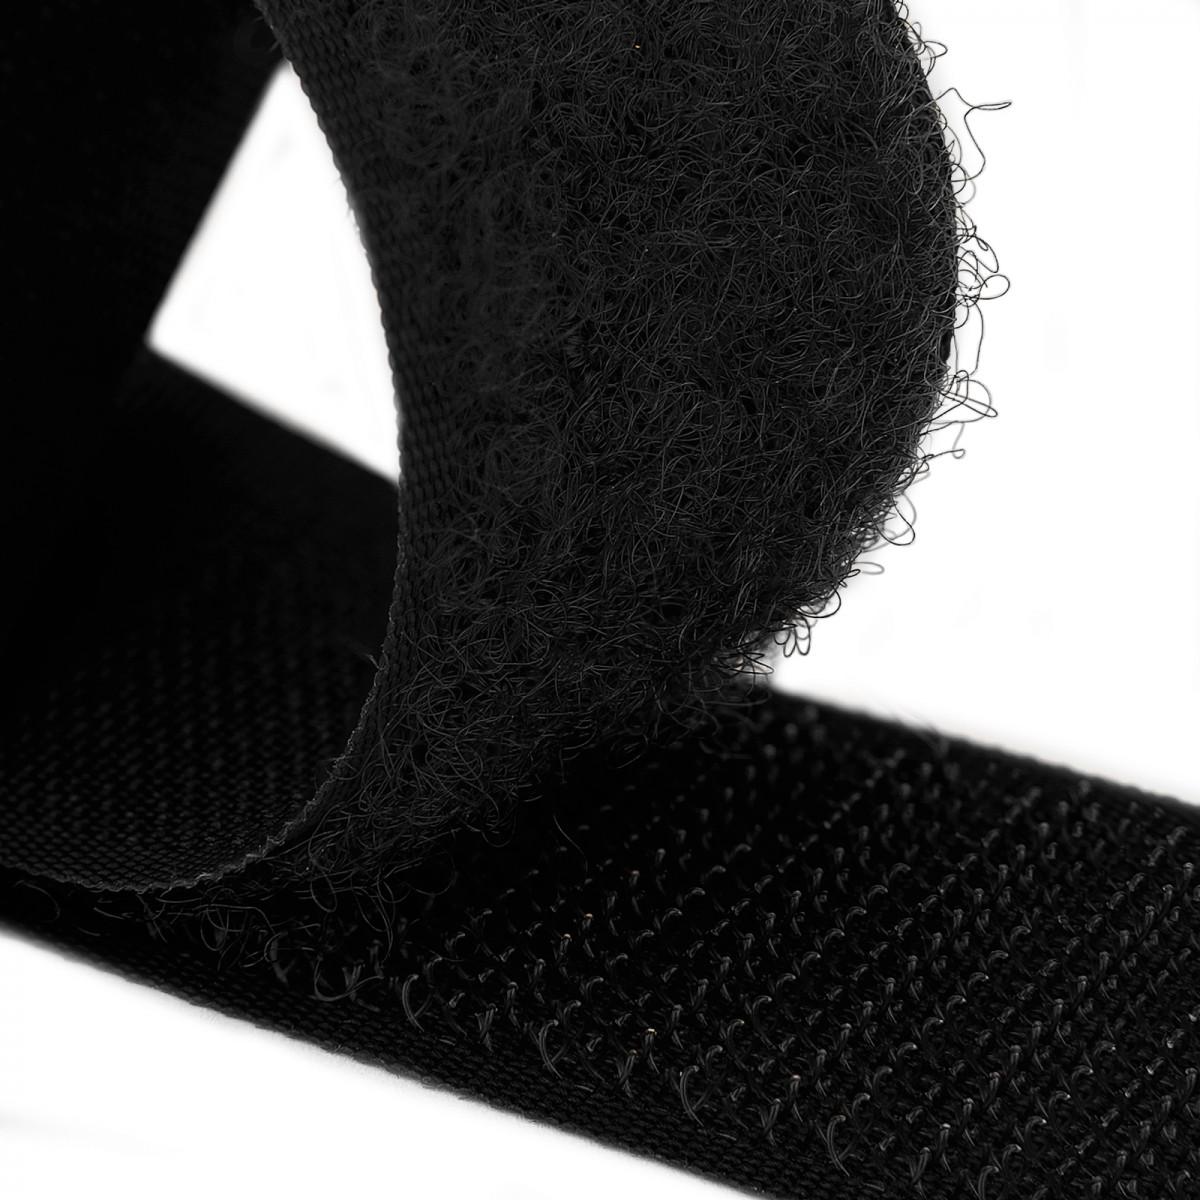 Country Brook DesignRed Sew On Hook And Loop 2 inch, 50 yards